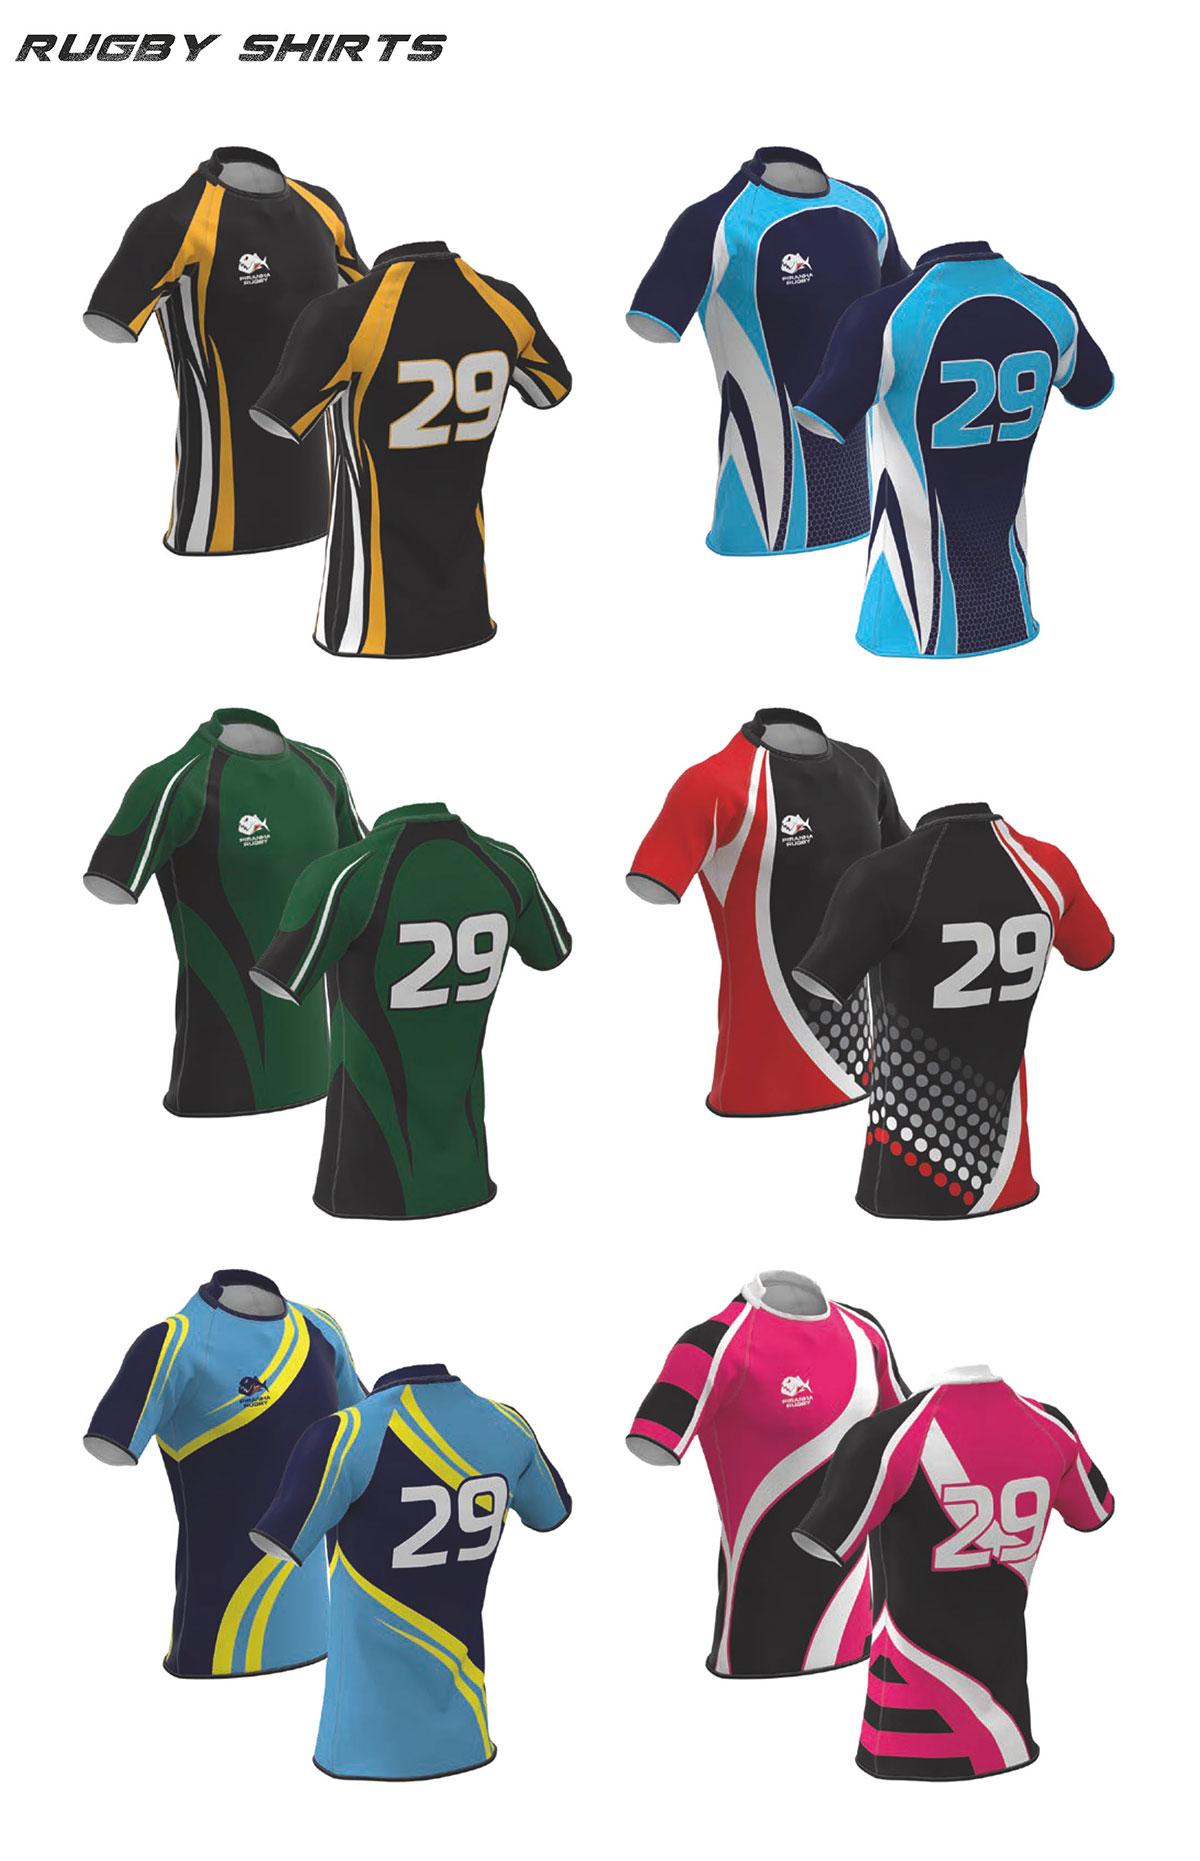 Piranha Rugby Shirts